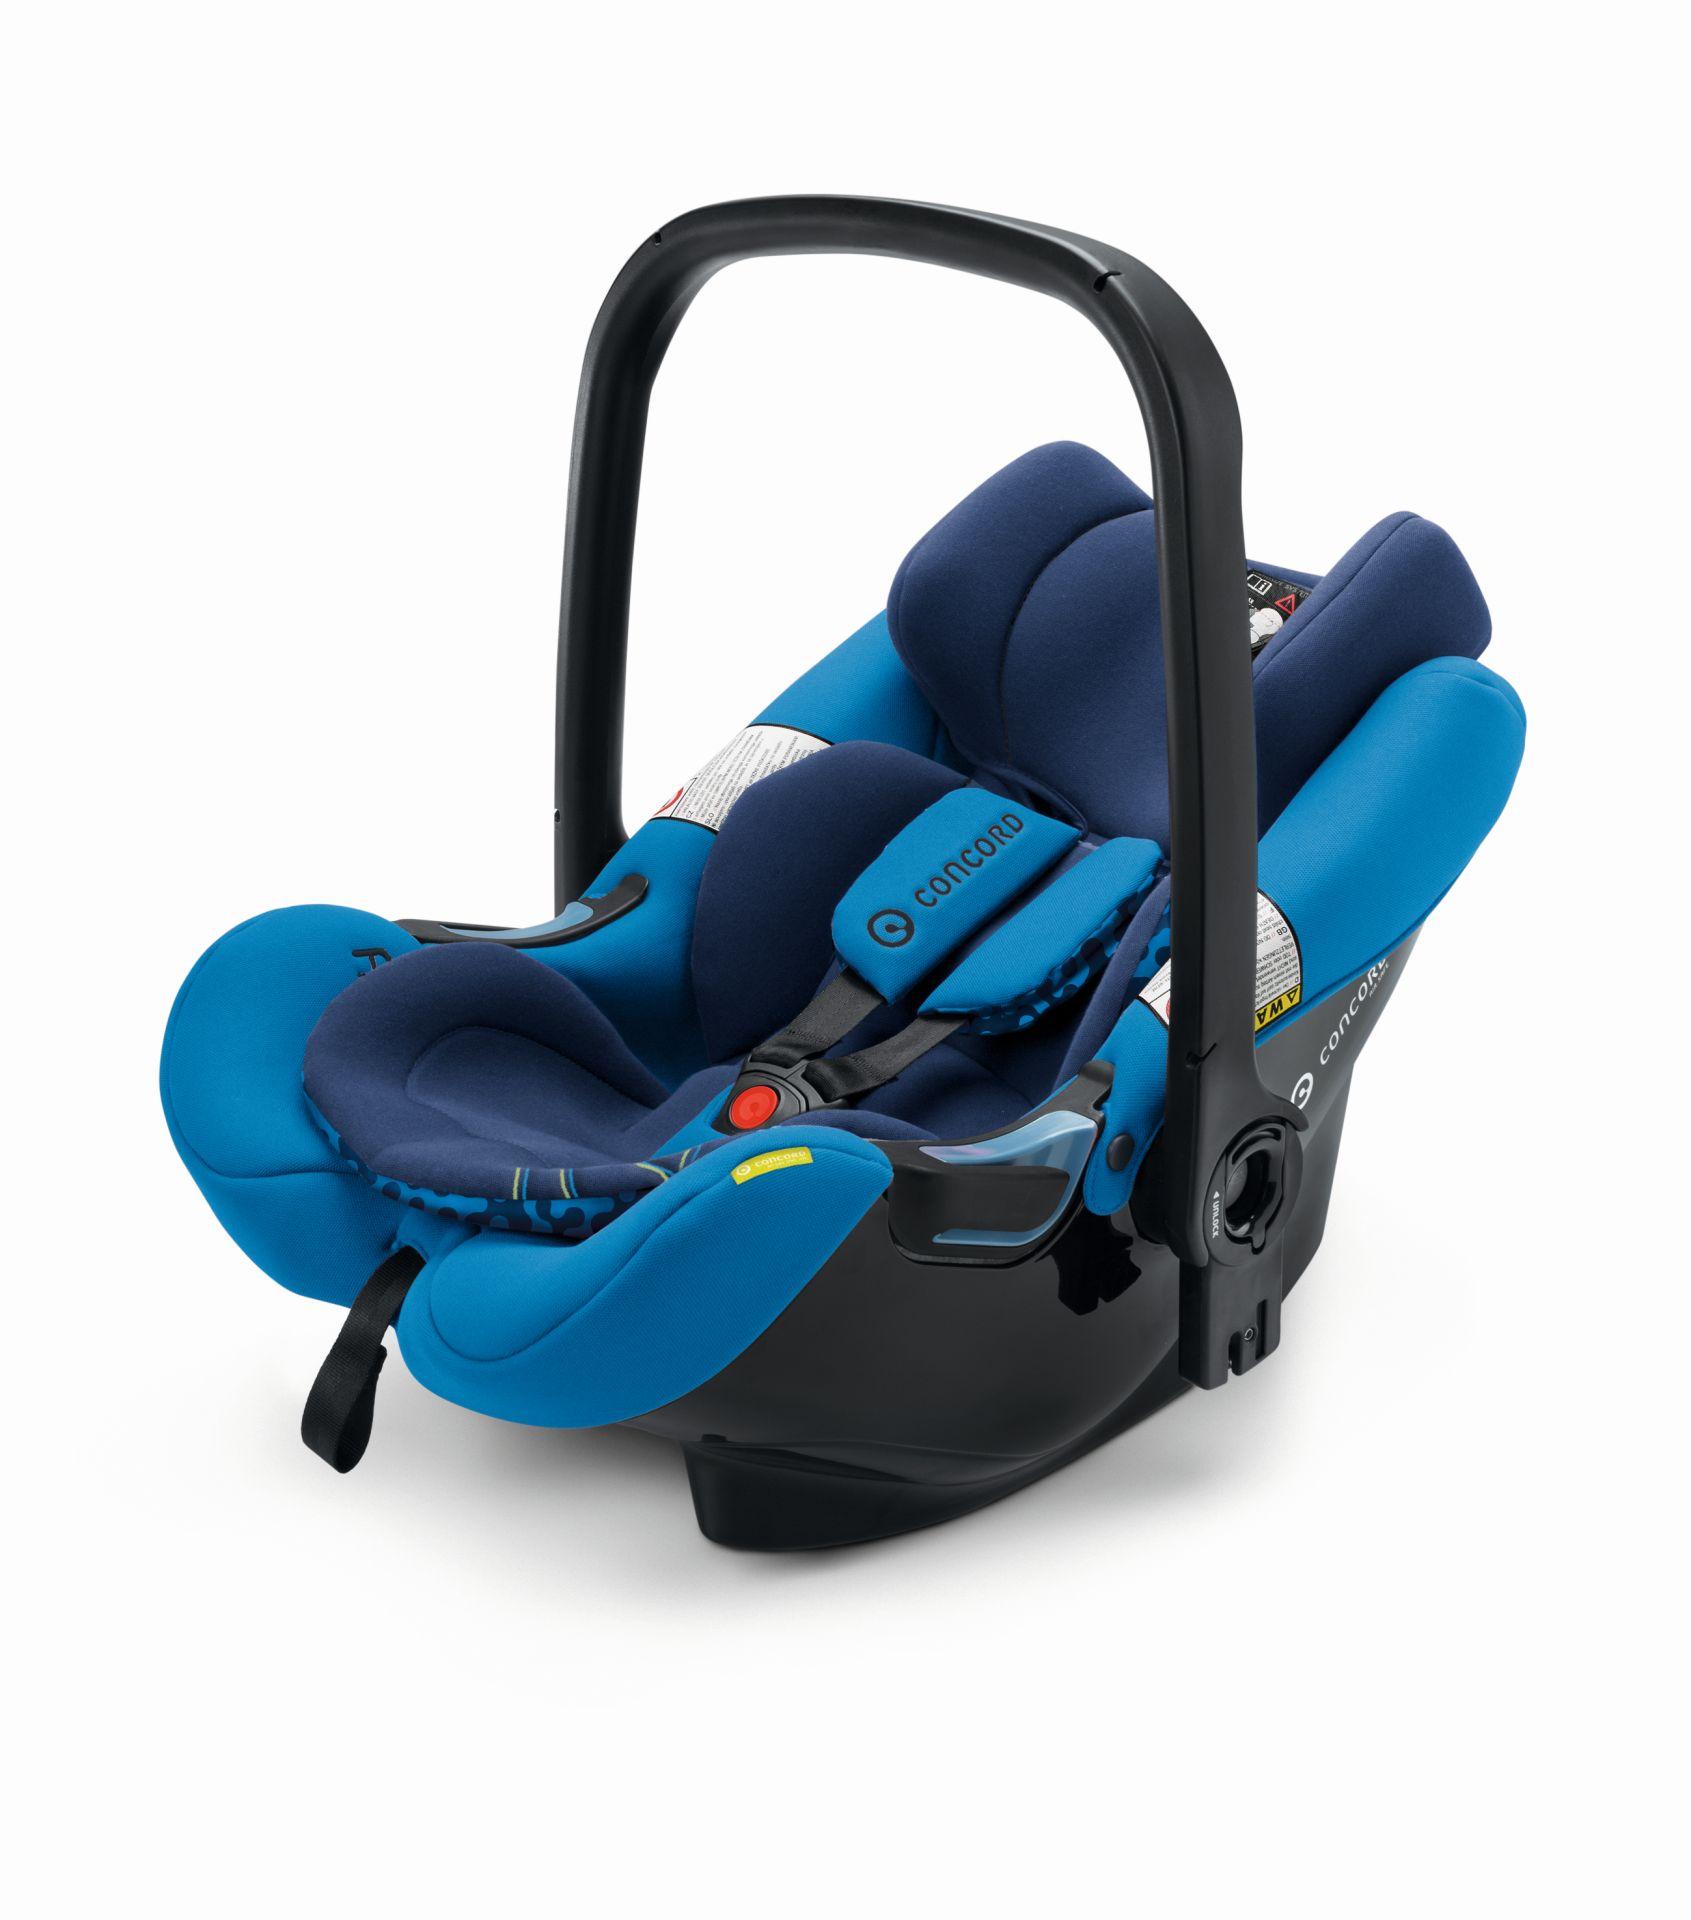 concord babyschale air safe online kaufen bei kidsroom. Black Bedroom Furniture Sets. Home Design Ideas